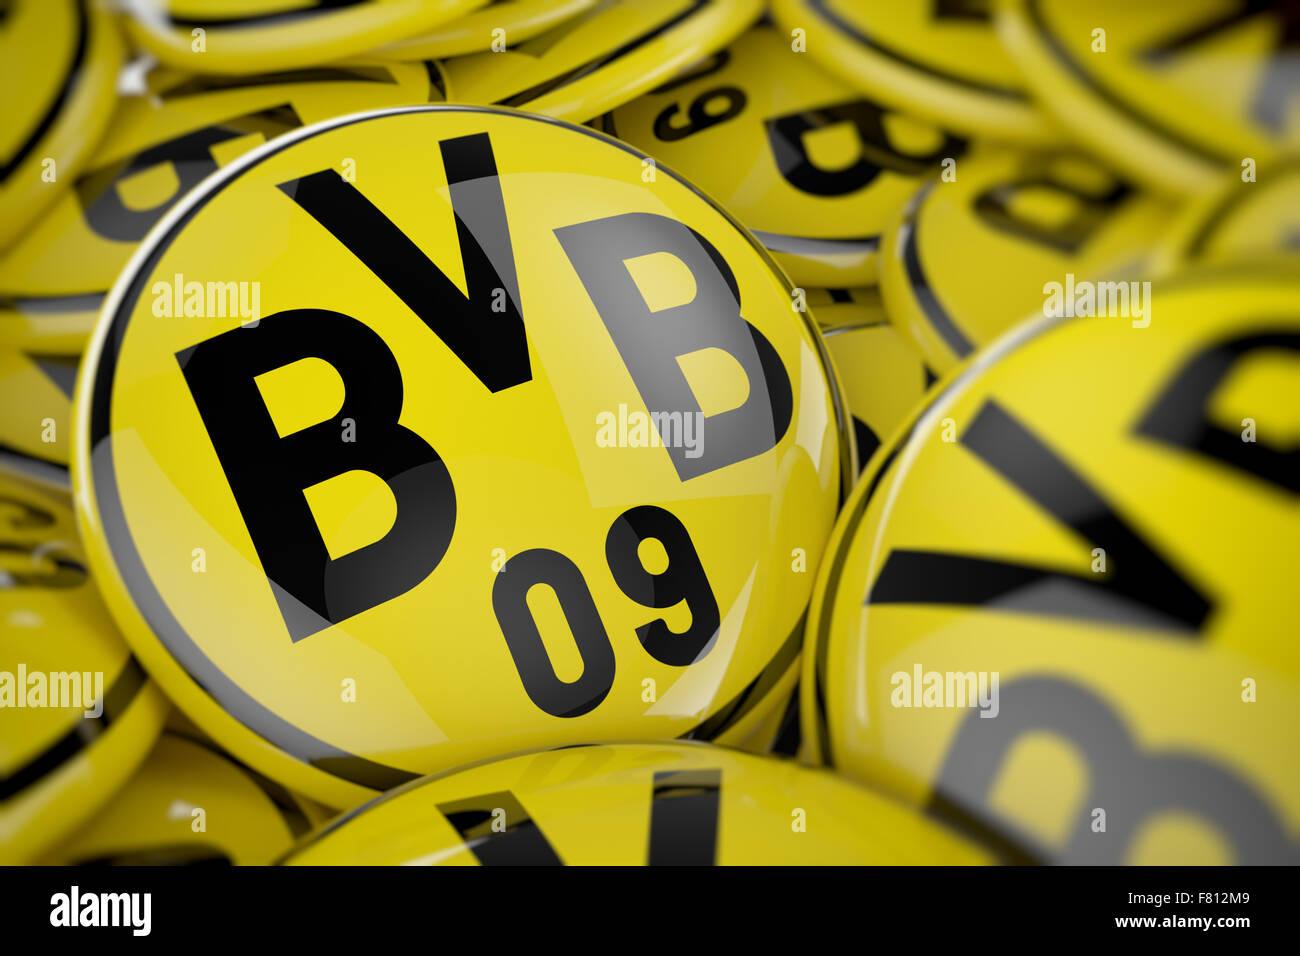 3D illustration of box full of Borussia Dortmund buttons - Stock Image